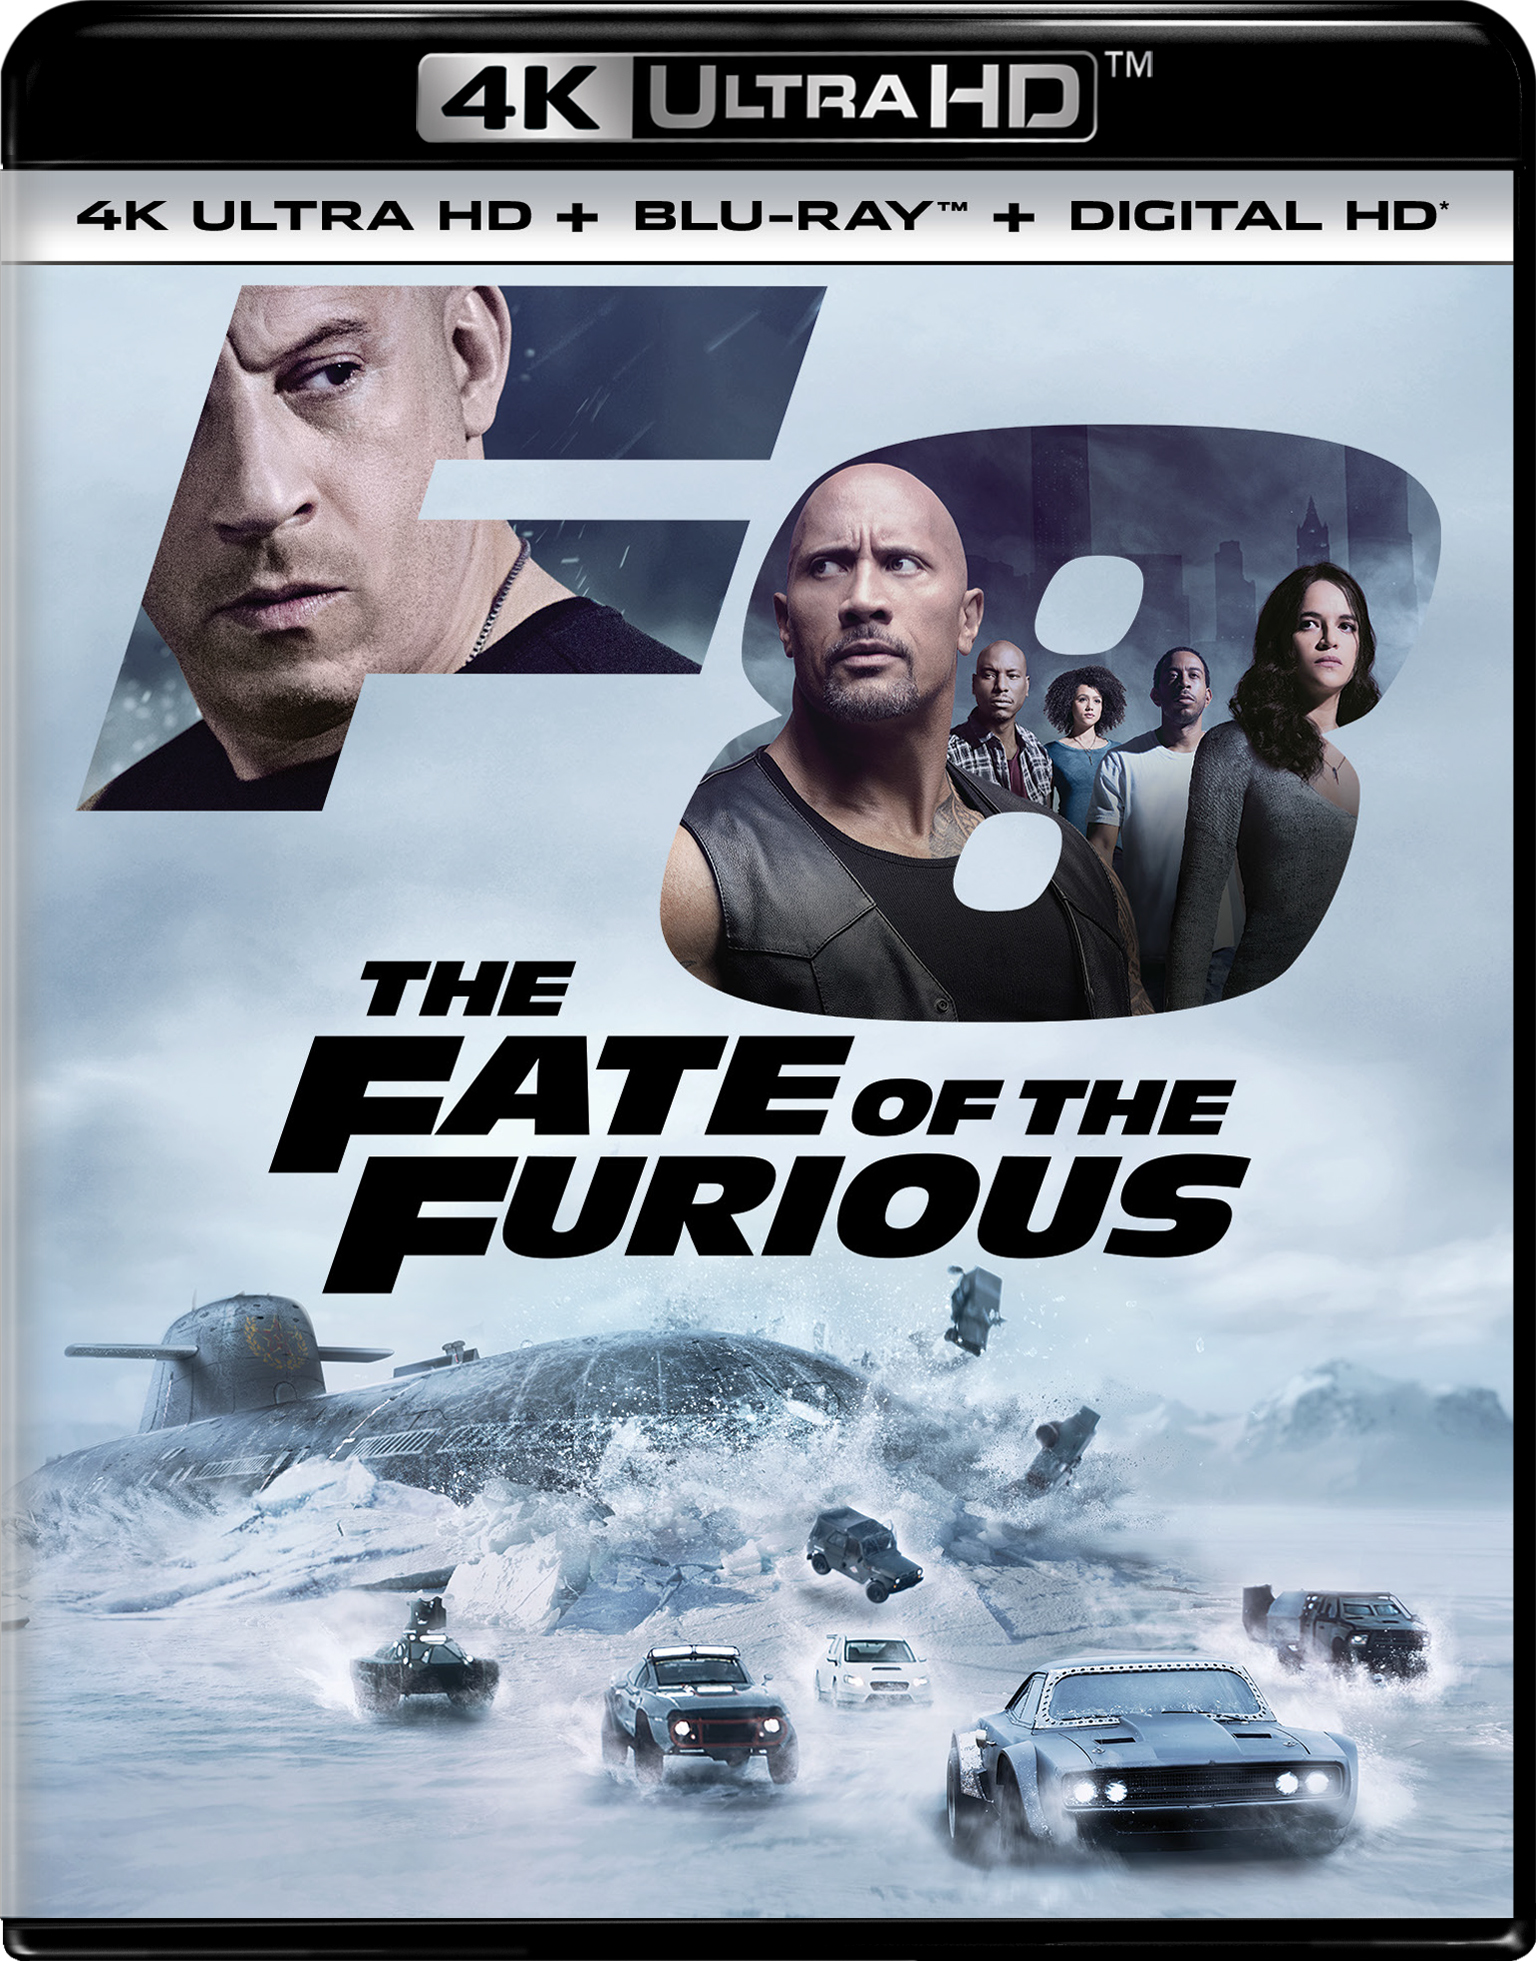 The Fate of the Furious 4K (2017) UHD Ultra HD Blu-ray